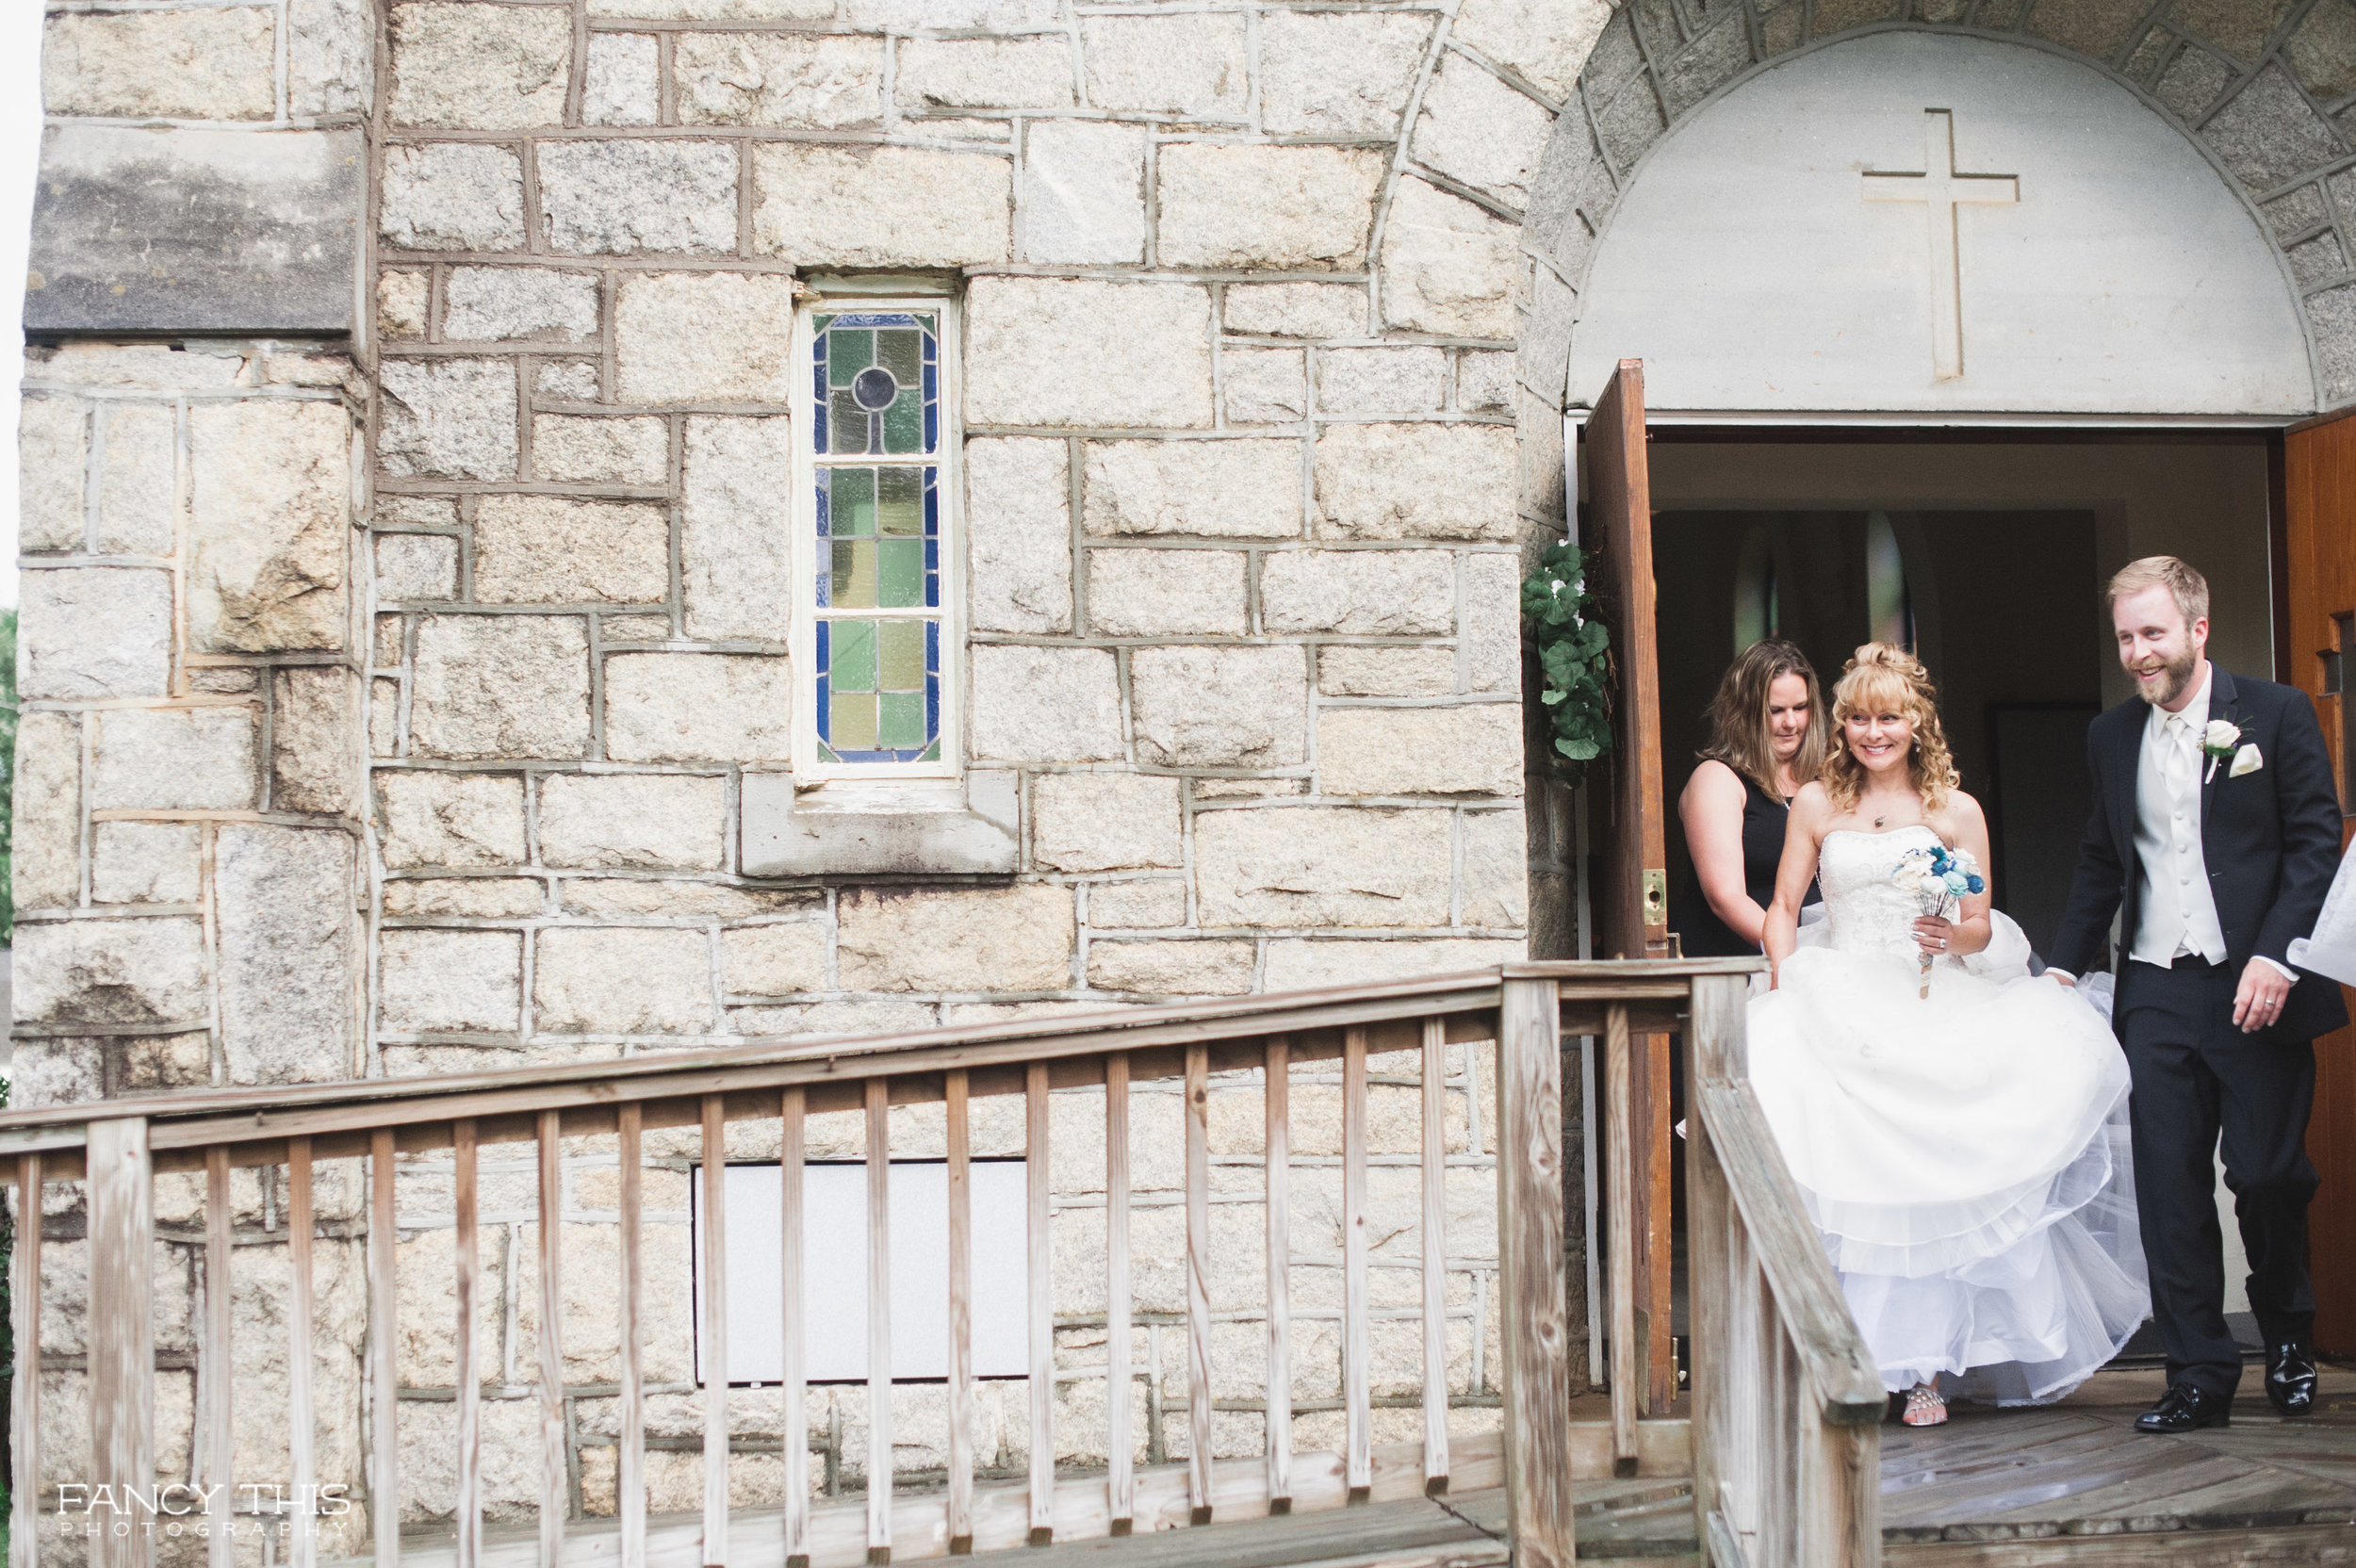 courtneyjasonwedding_socialmediaready159.jpg